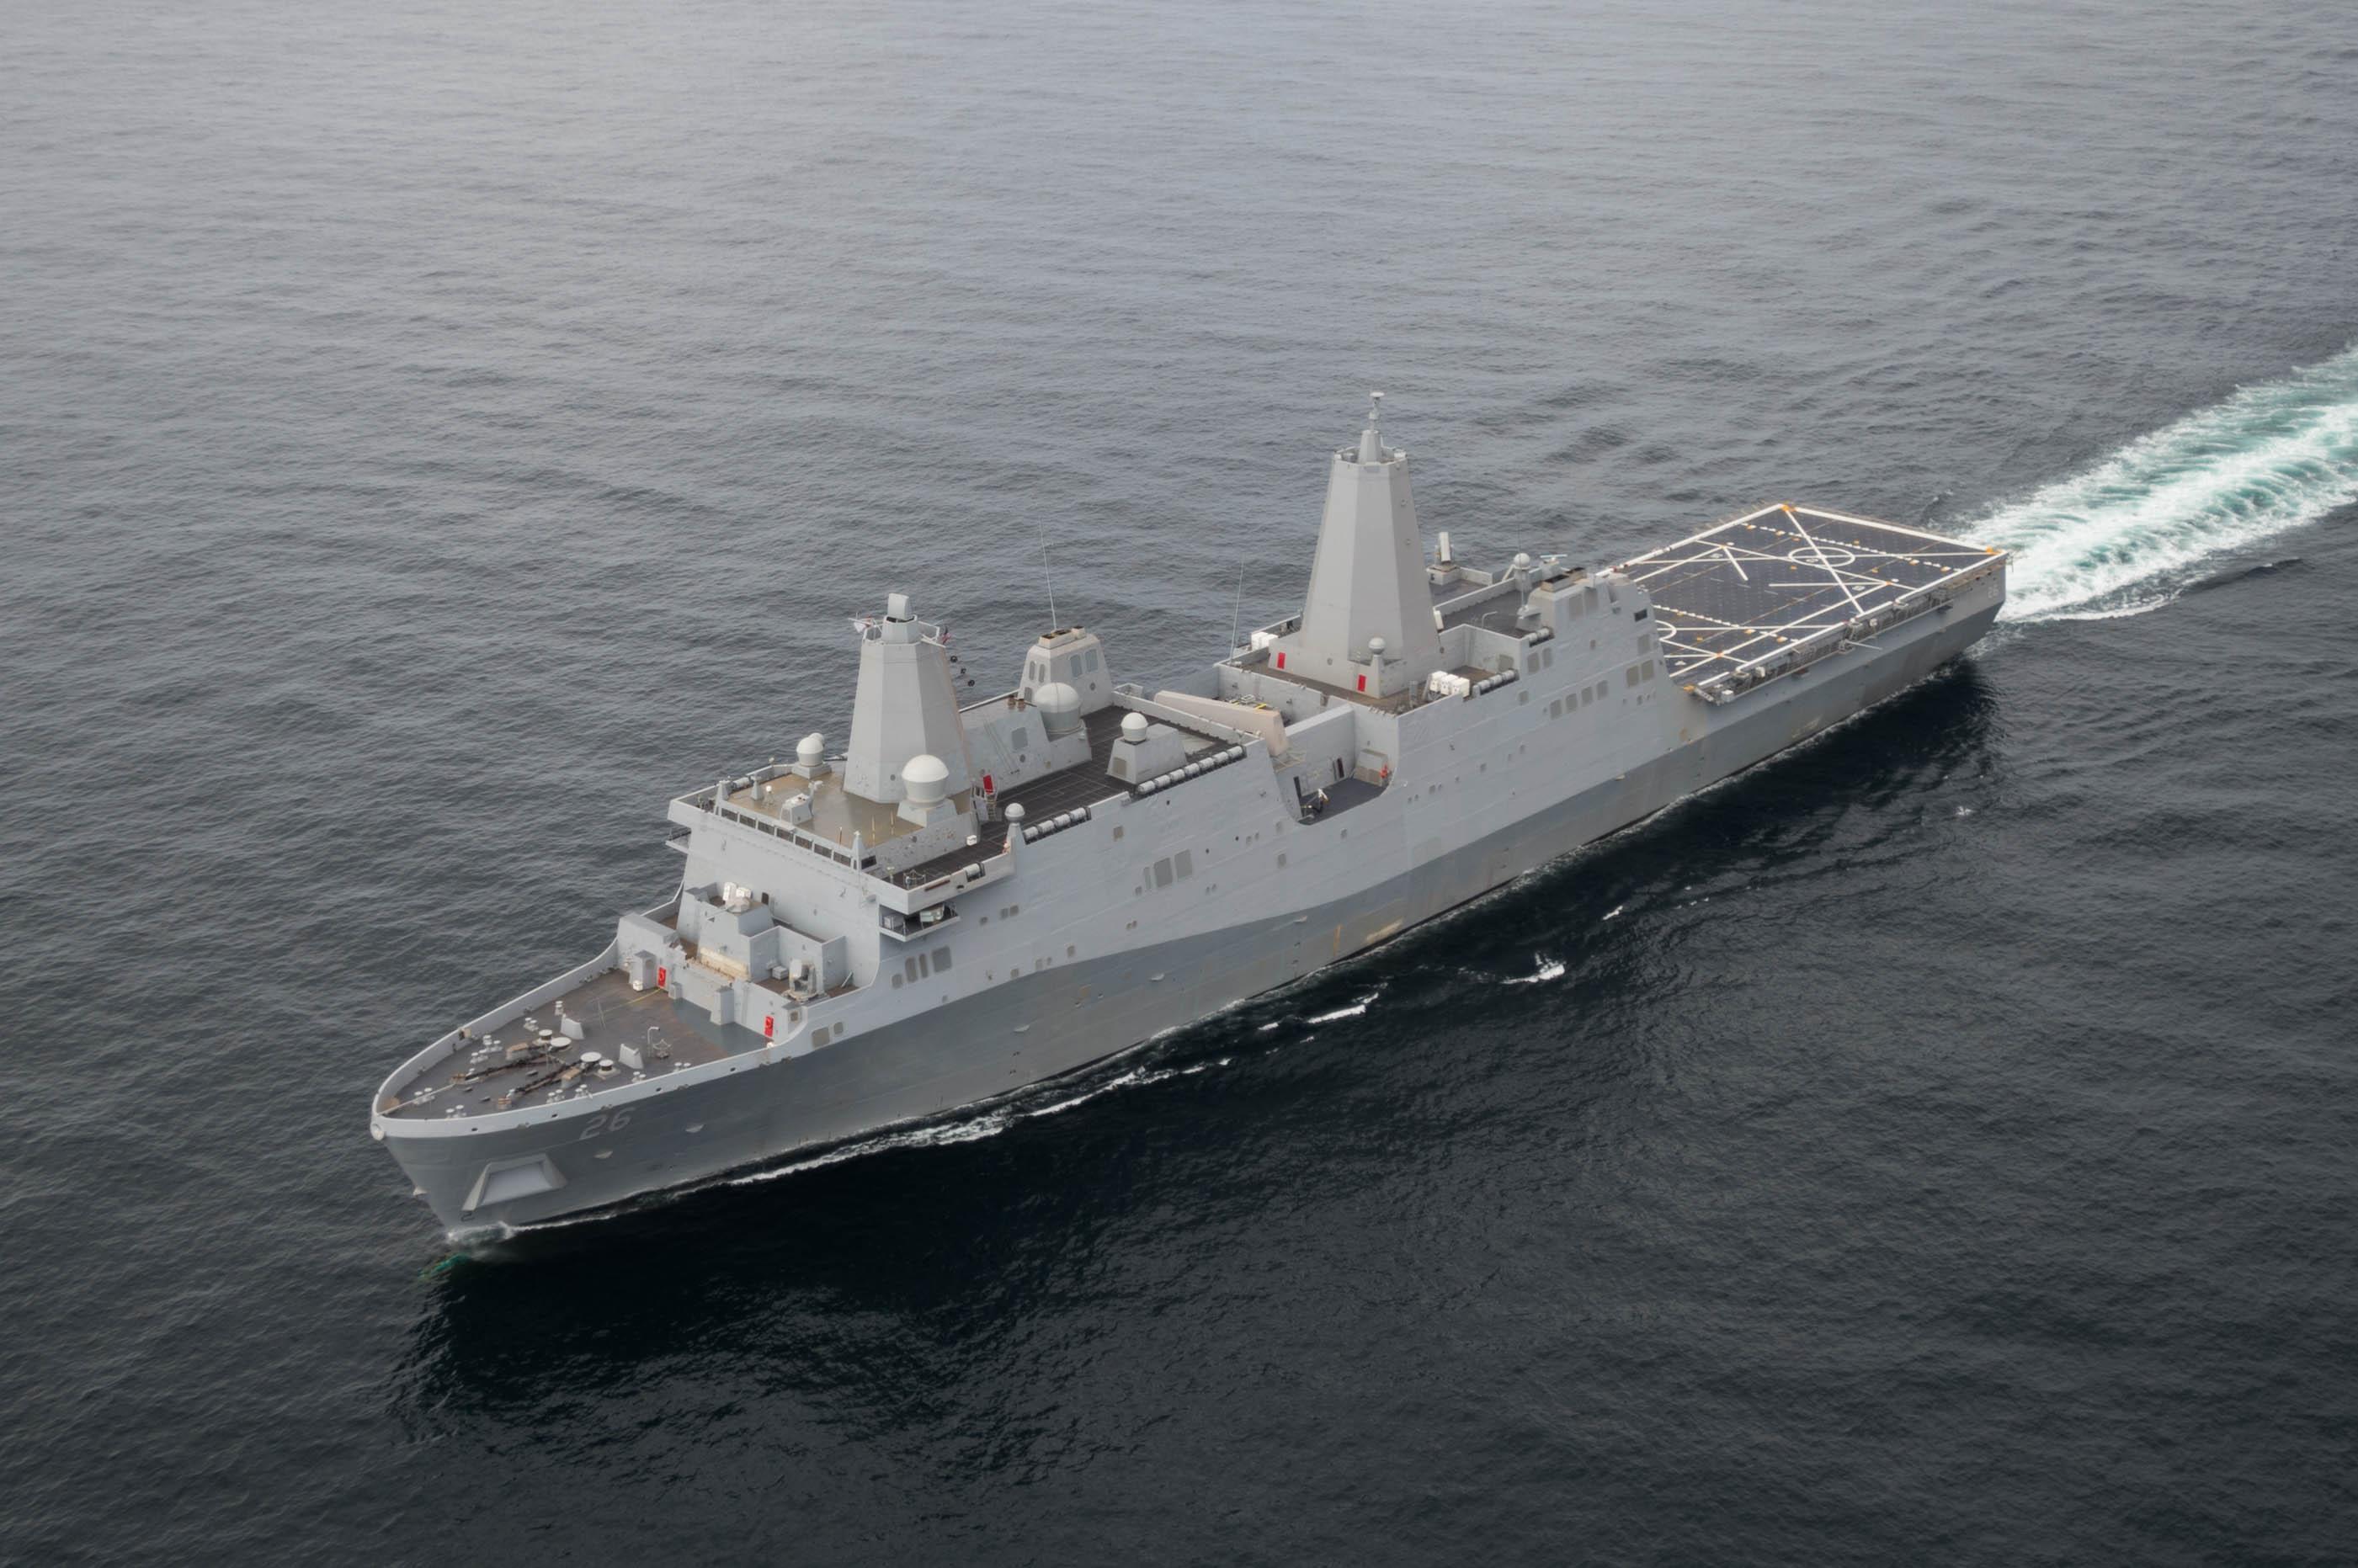 USS JOHN P. MURTHA LPD-26 See-Erprobung Bild: Huntington Industries